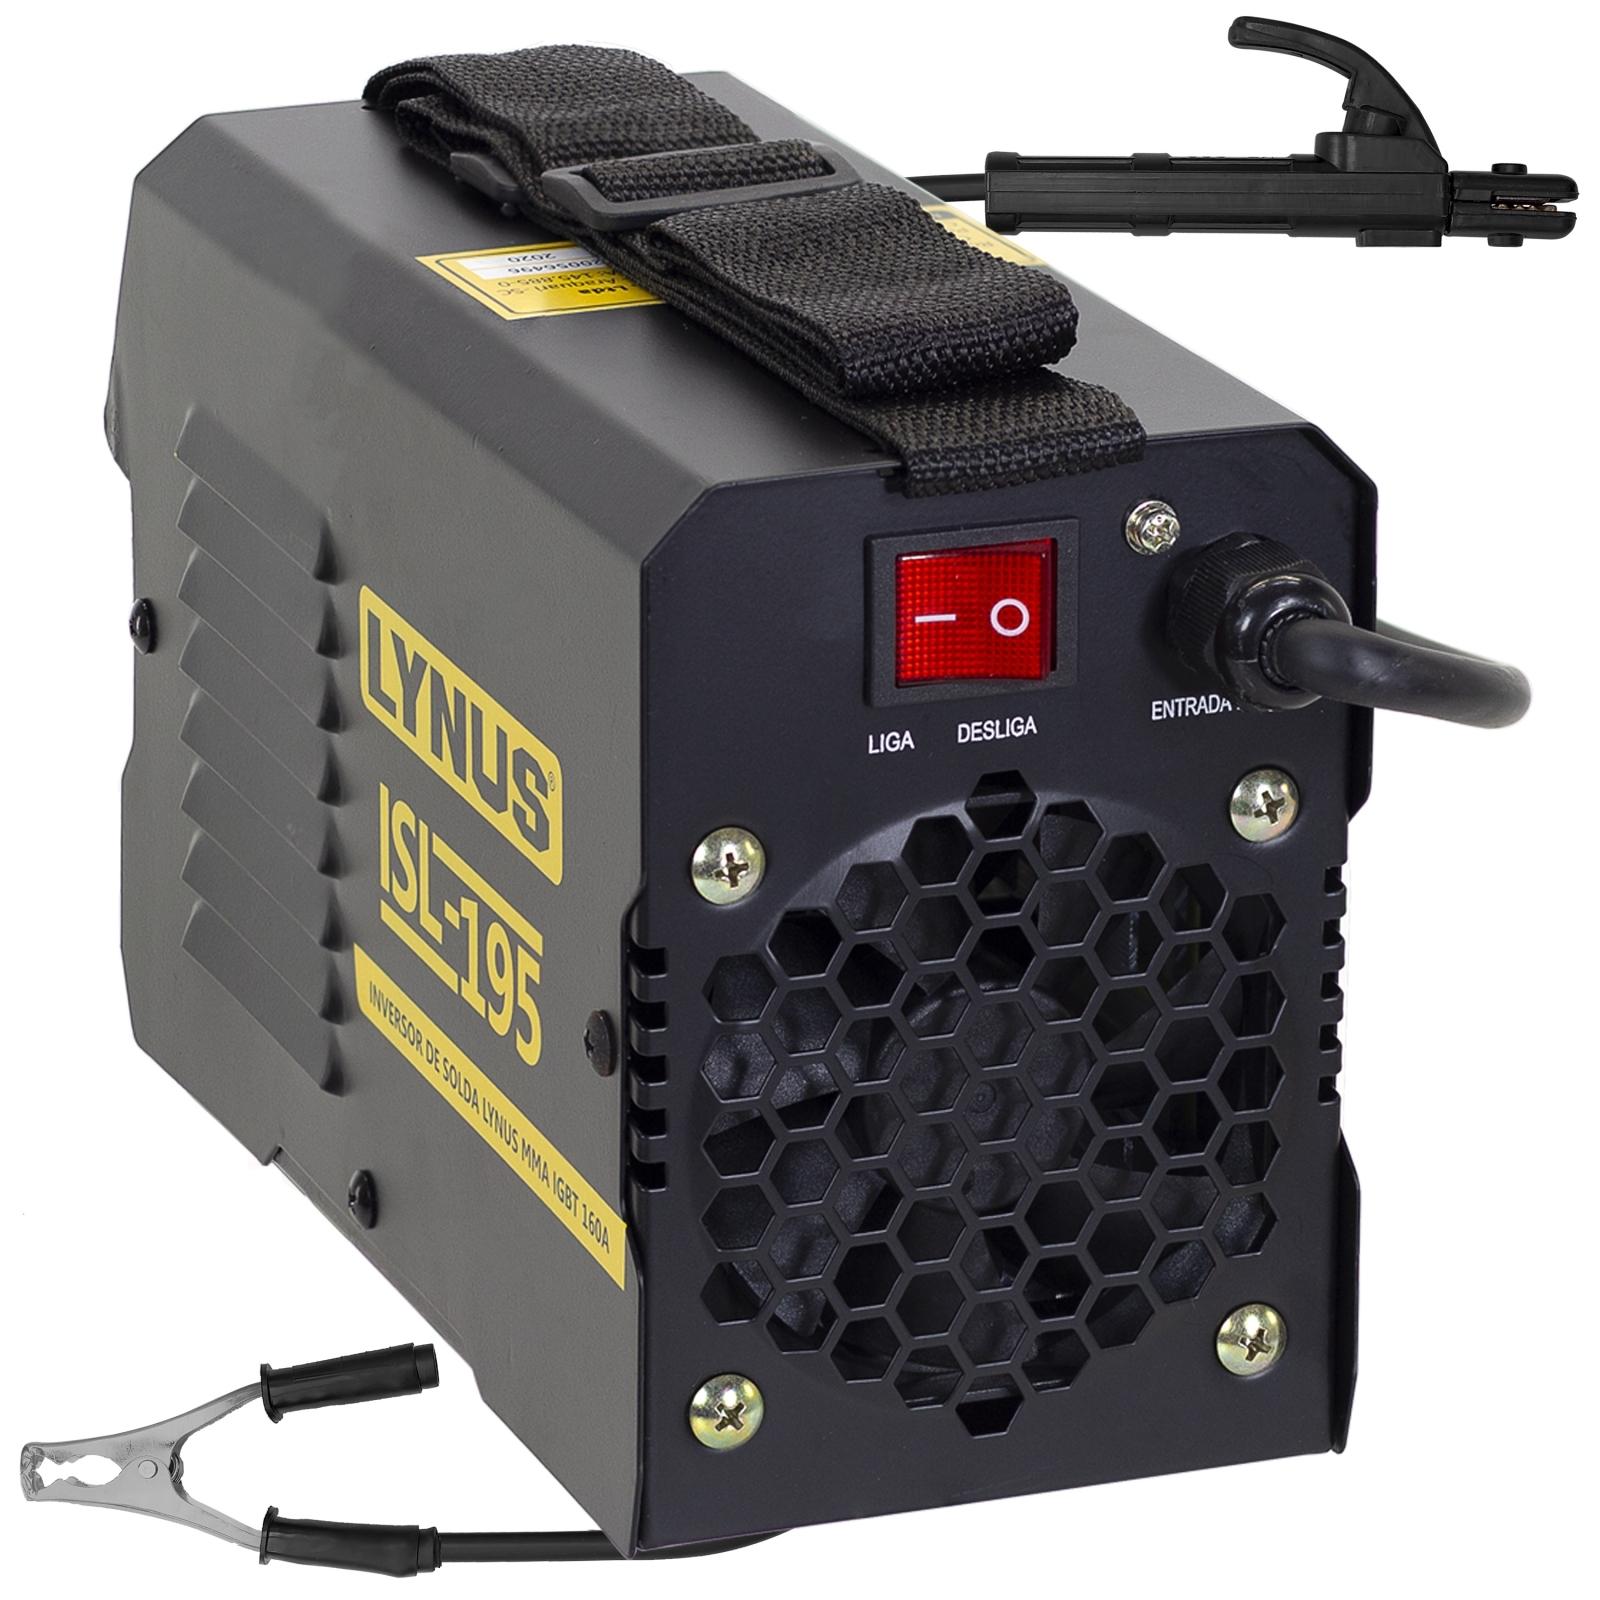 Máquina De Solda Inversora Lynus 160amp 220v Isl-195 Sl6 - Ferramentas MEP